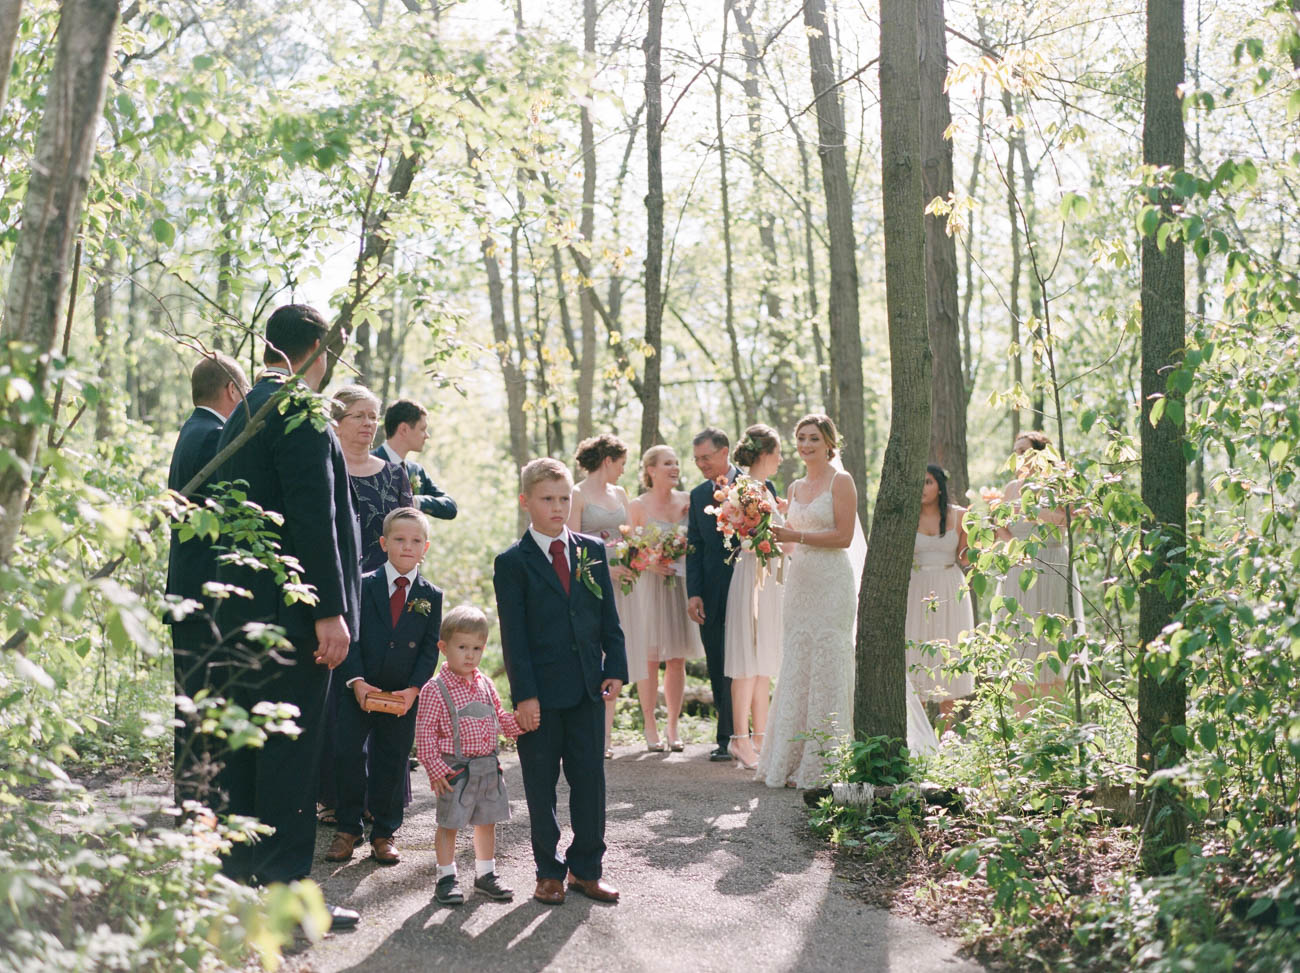 kateweinsteinphoto_schlitz_audubon_milwaukee_wedding-195.jpg